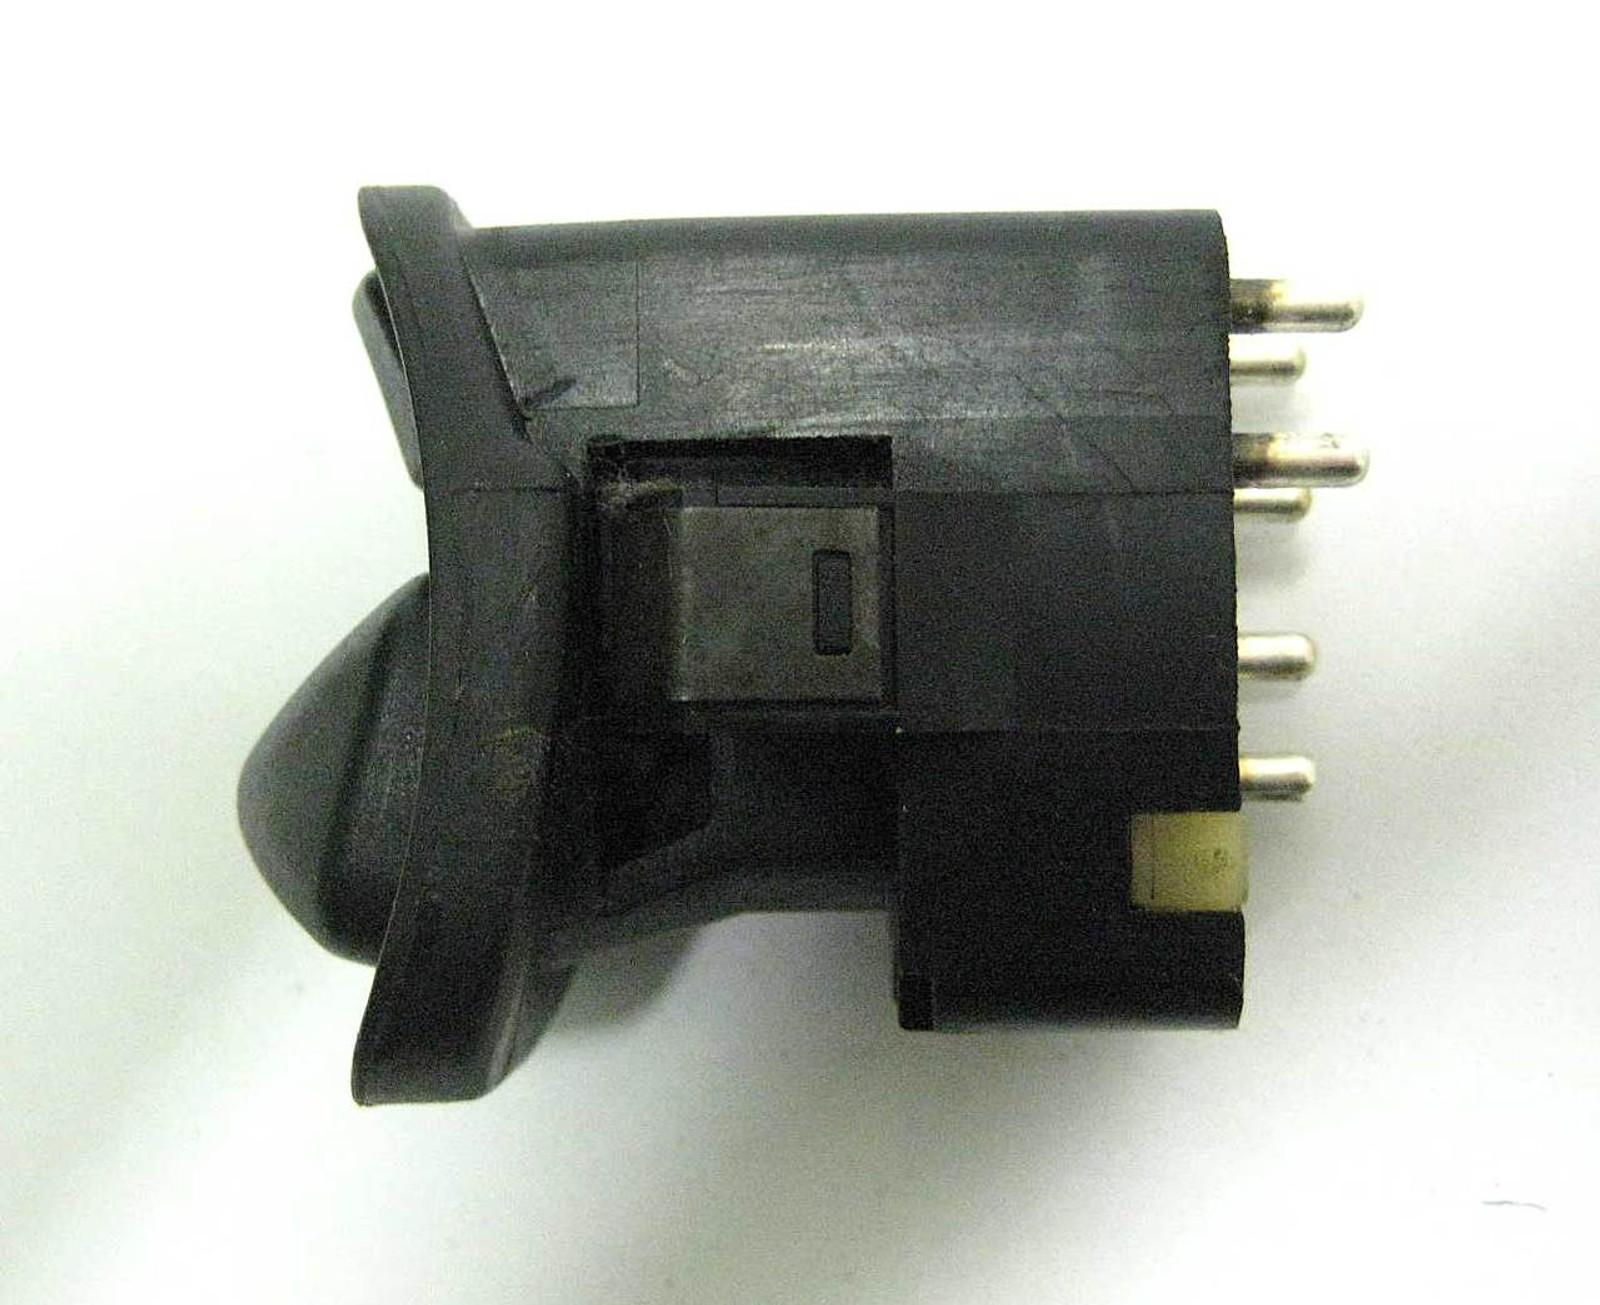 Bmw Power Mirror Adjustment Switch 1983 2002 E30 E24 E32 E34 318ti Wiring Diagram